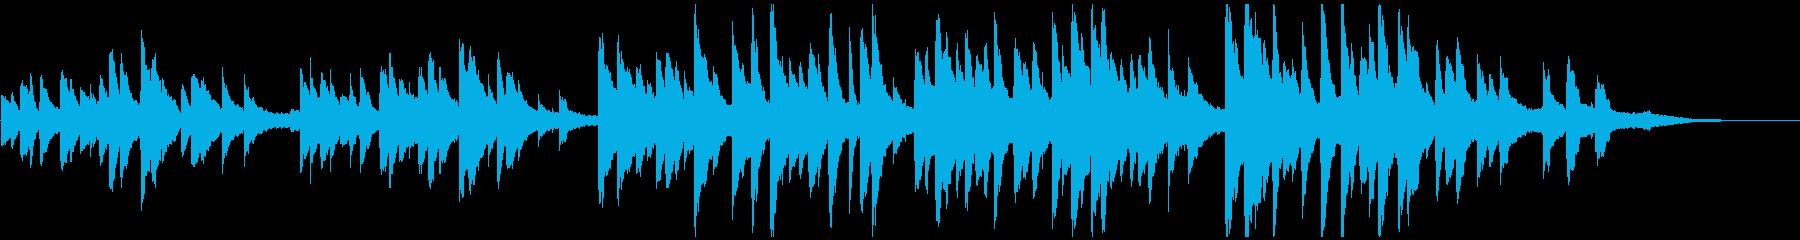 youtube映像に 切ないピアノソロの再生済みの波形